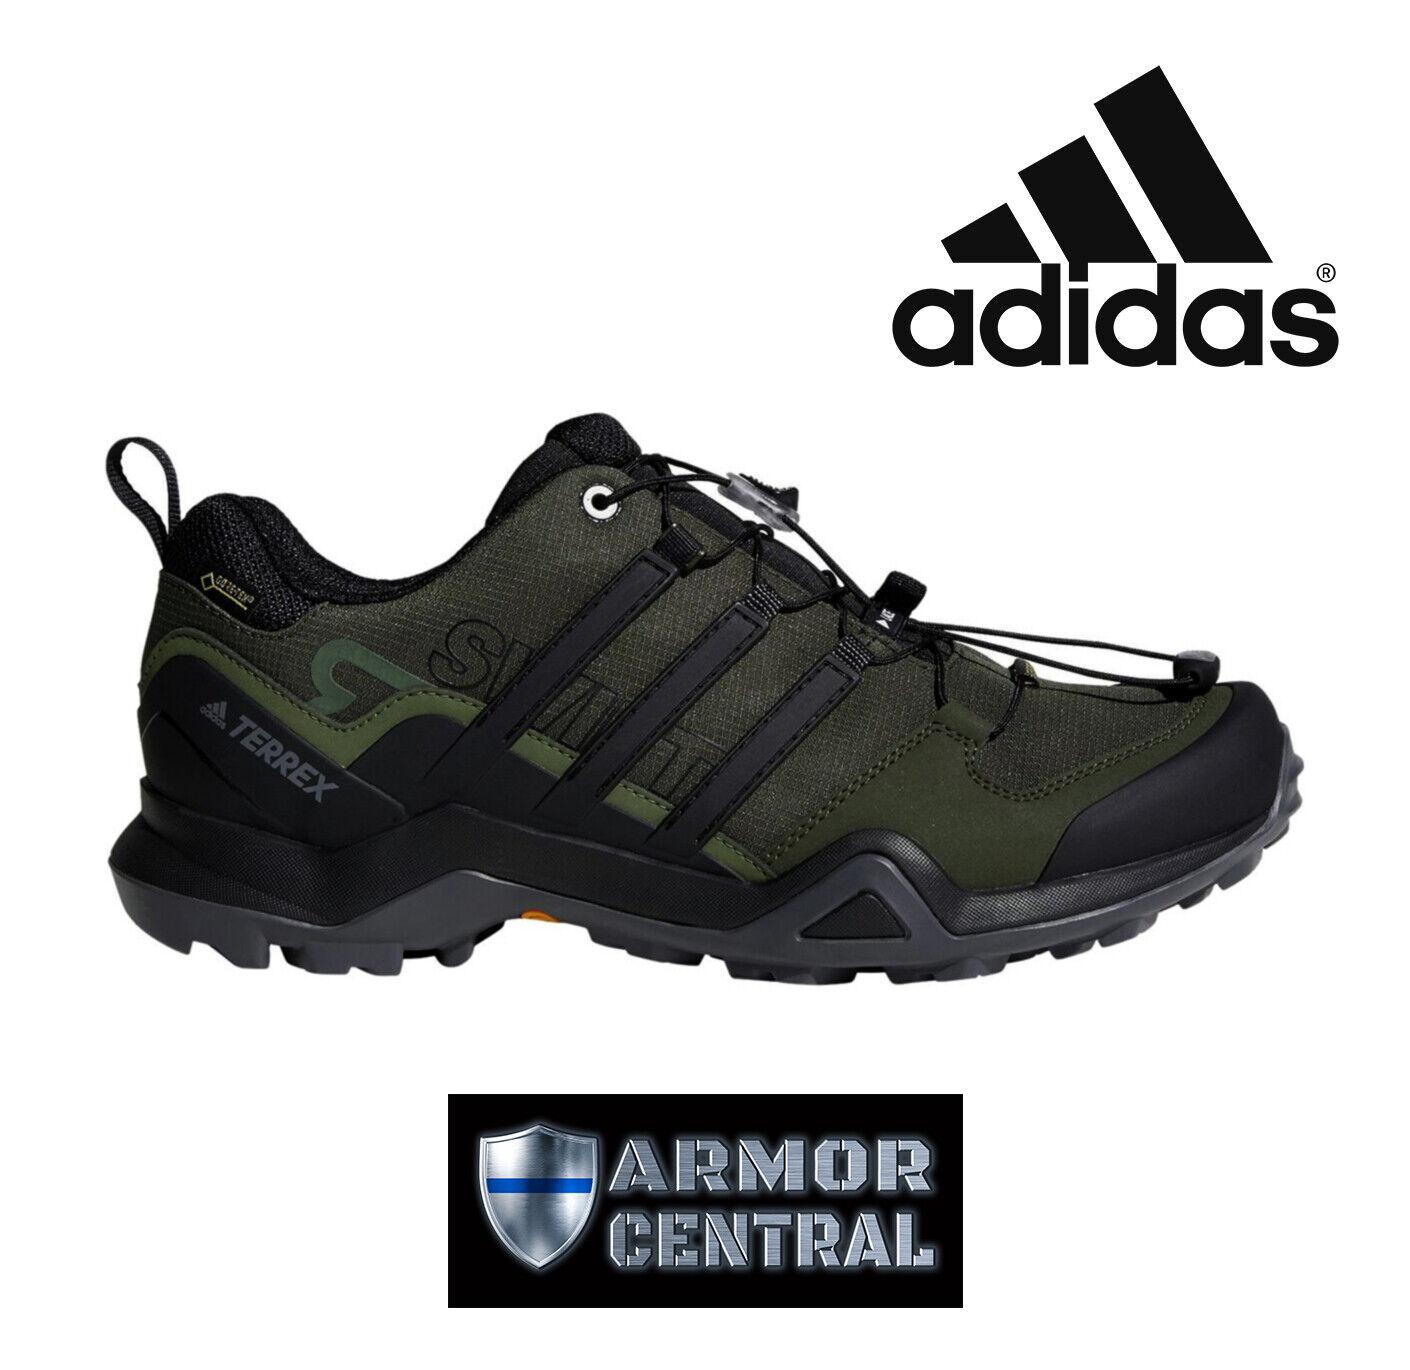 NEW Men's Green Adidas Terrex Swift R2 GTX Shoes - Waterproof - CM7497